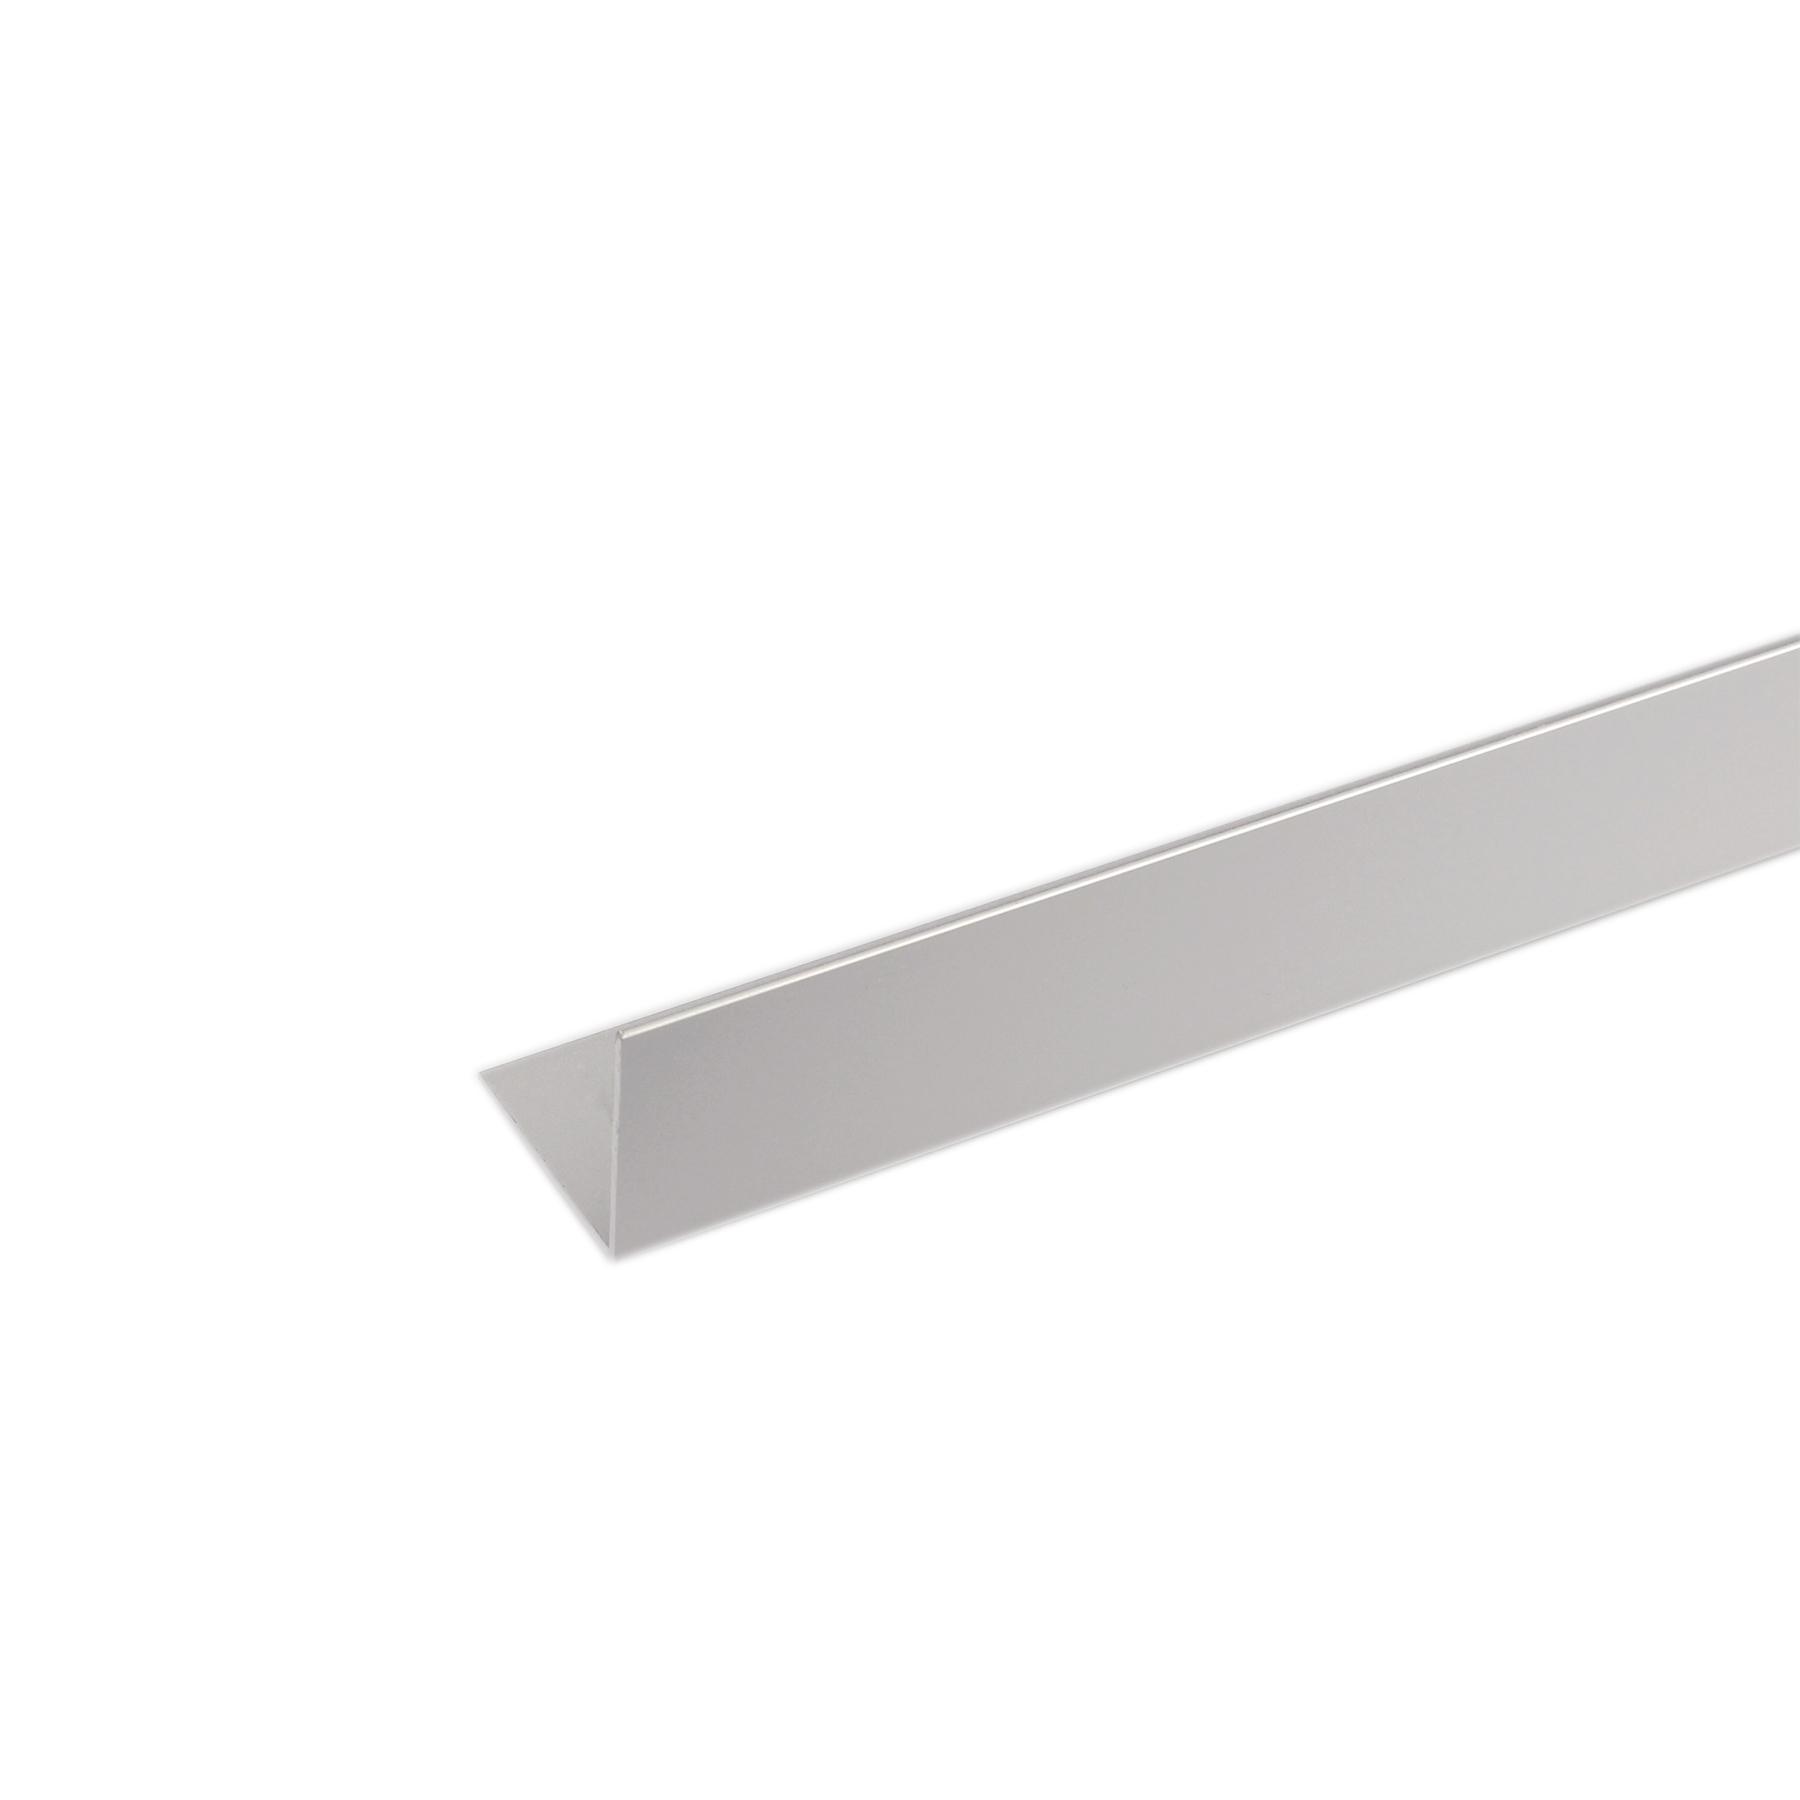 Perfil Canto Alumínio Anodizado 2mx1,5cm